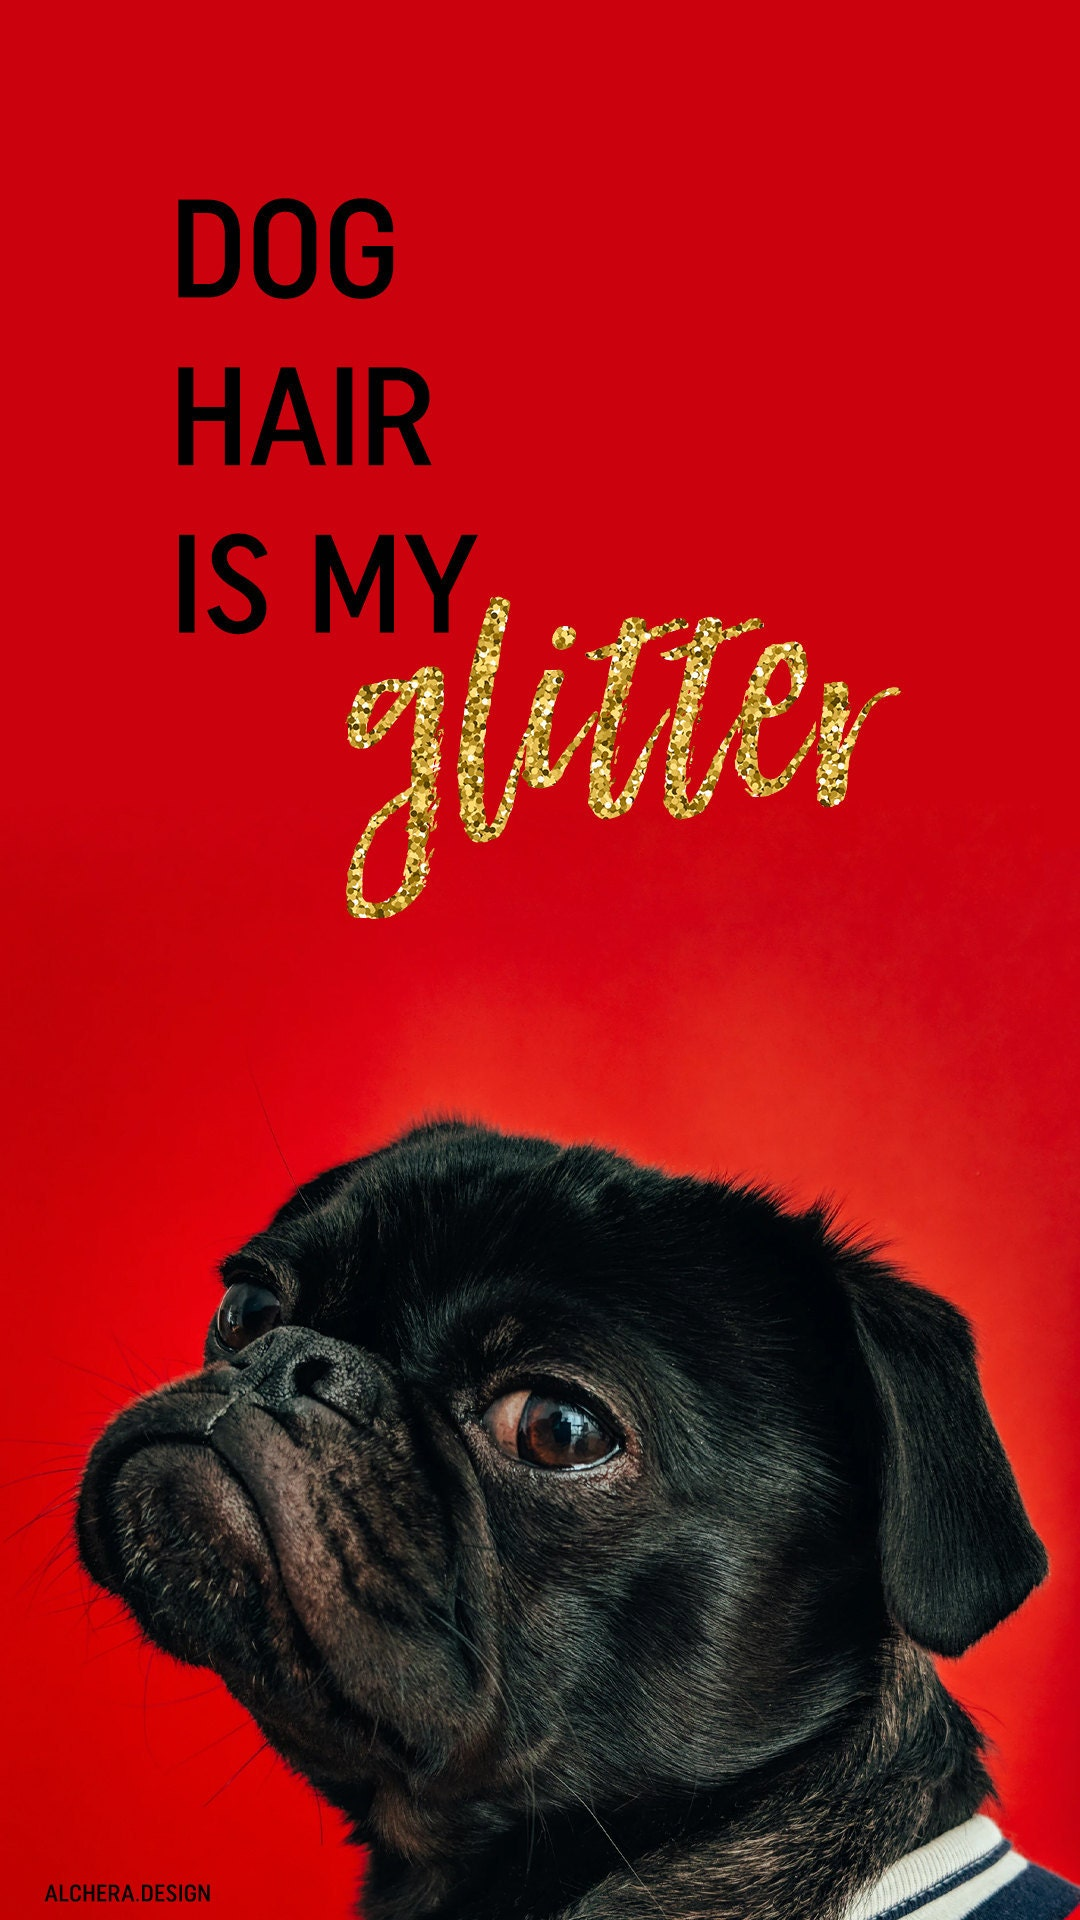 Dog hair is my glitter.